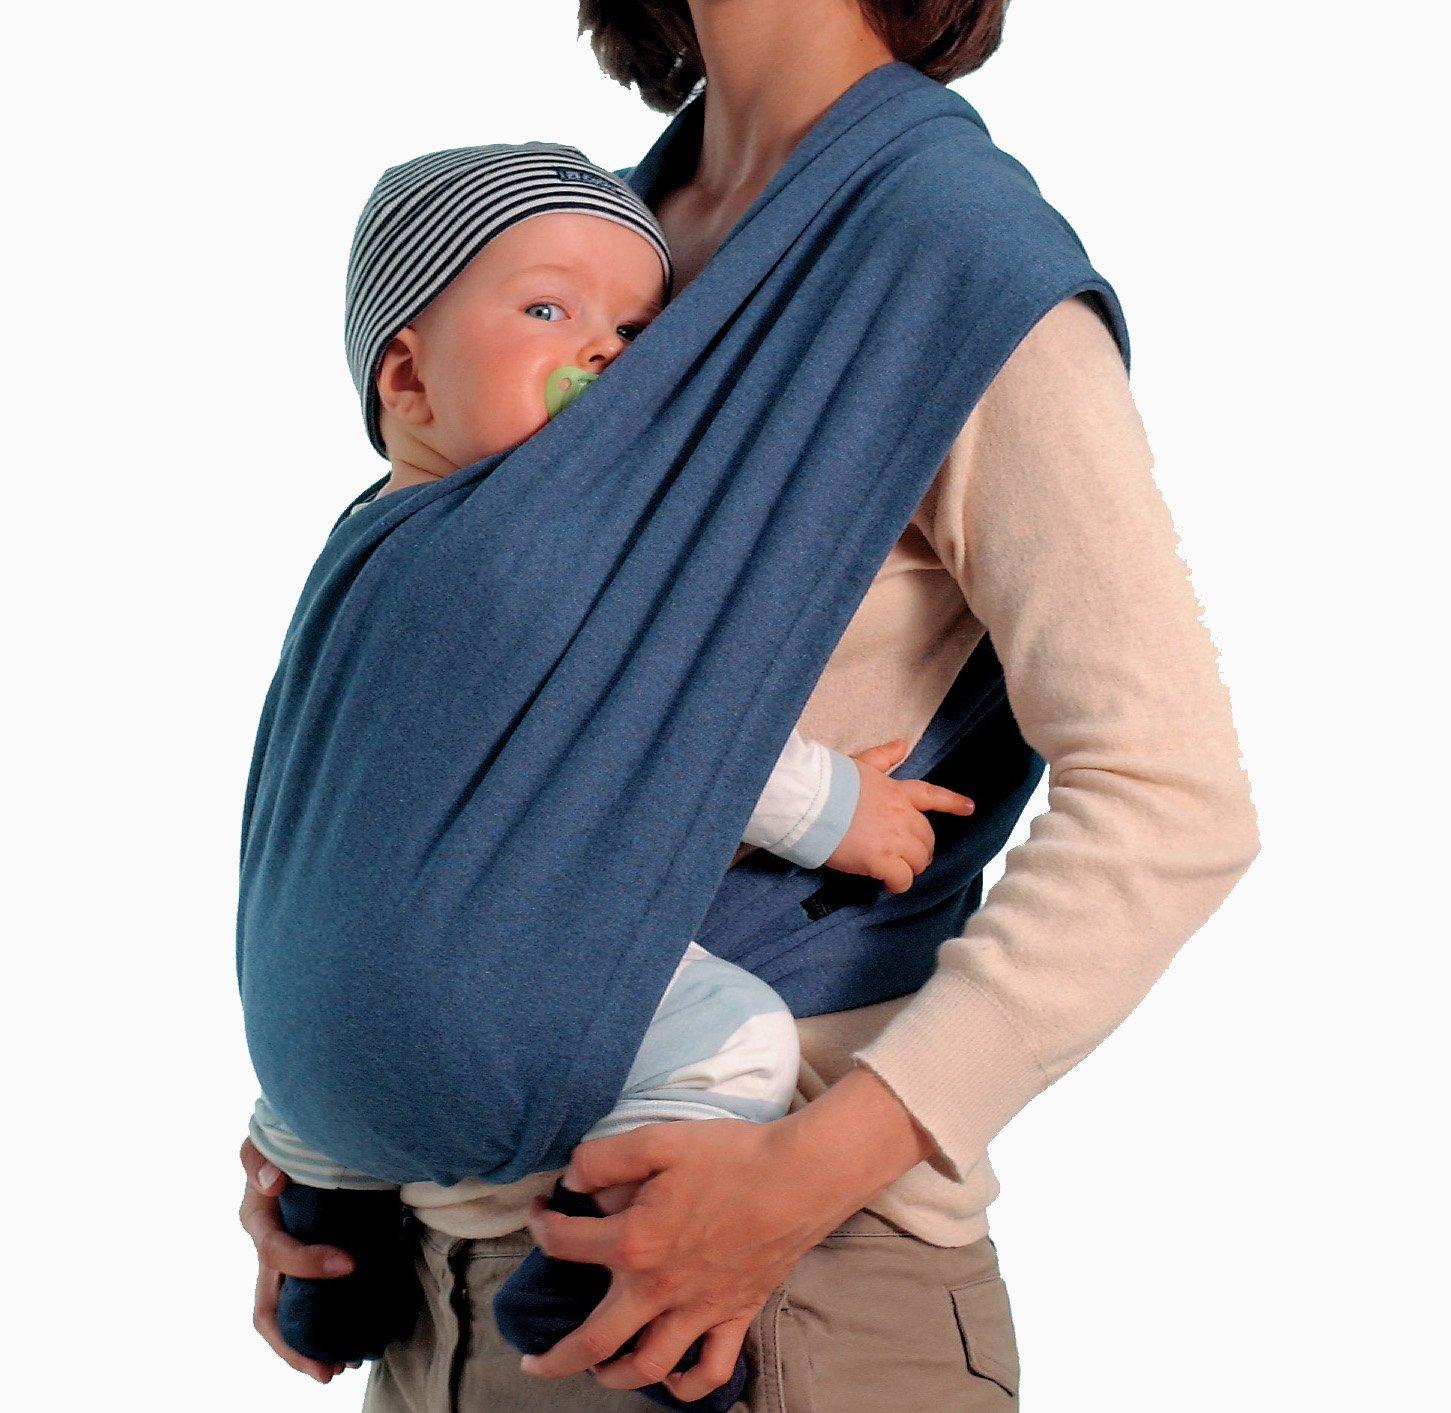 echarpe de portage sans noeud carry baby amazonas. Black Bedroom Furniture Sets. Home Design Ideas